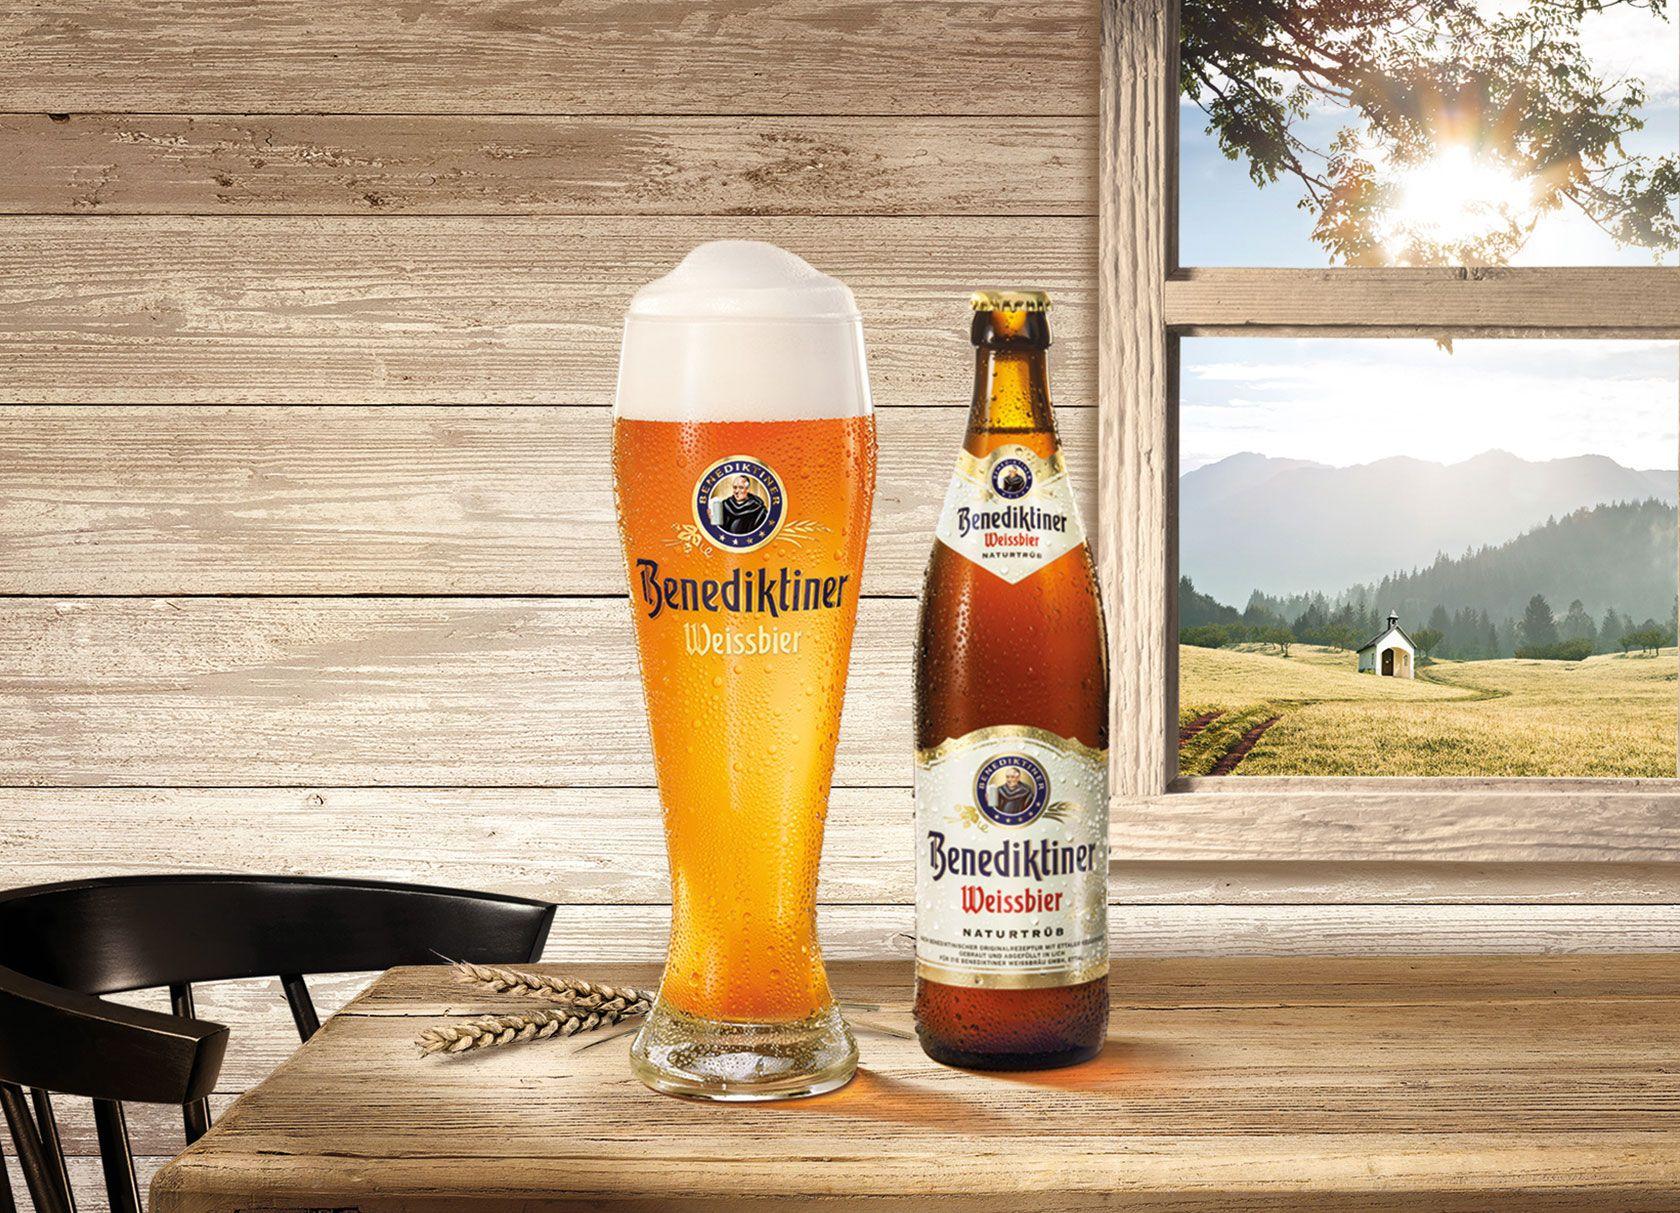 Agecheck Weissbier Bier Benediktiner